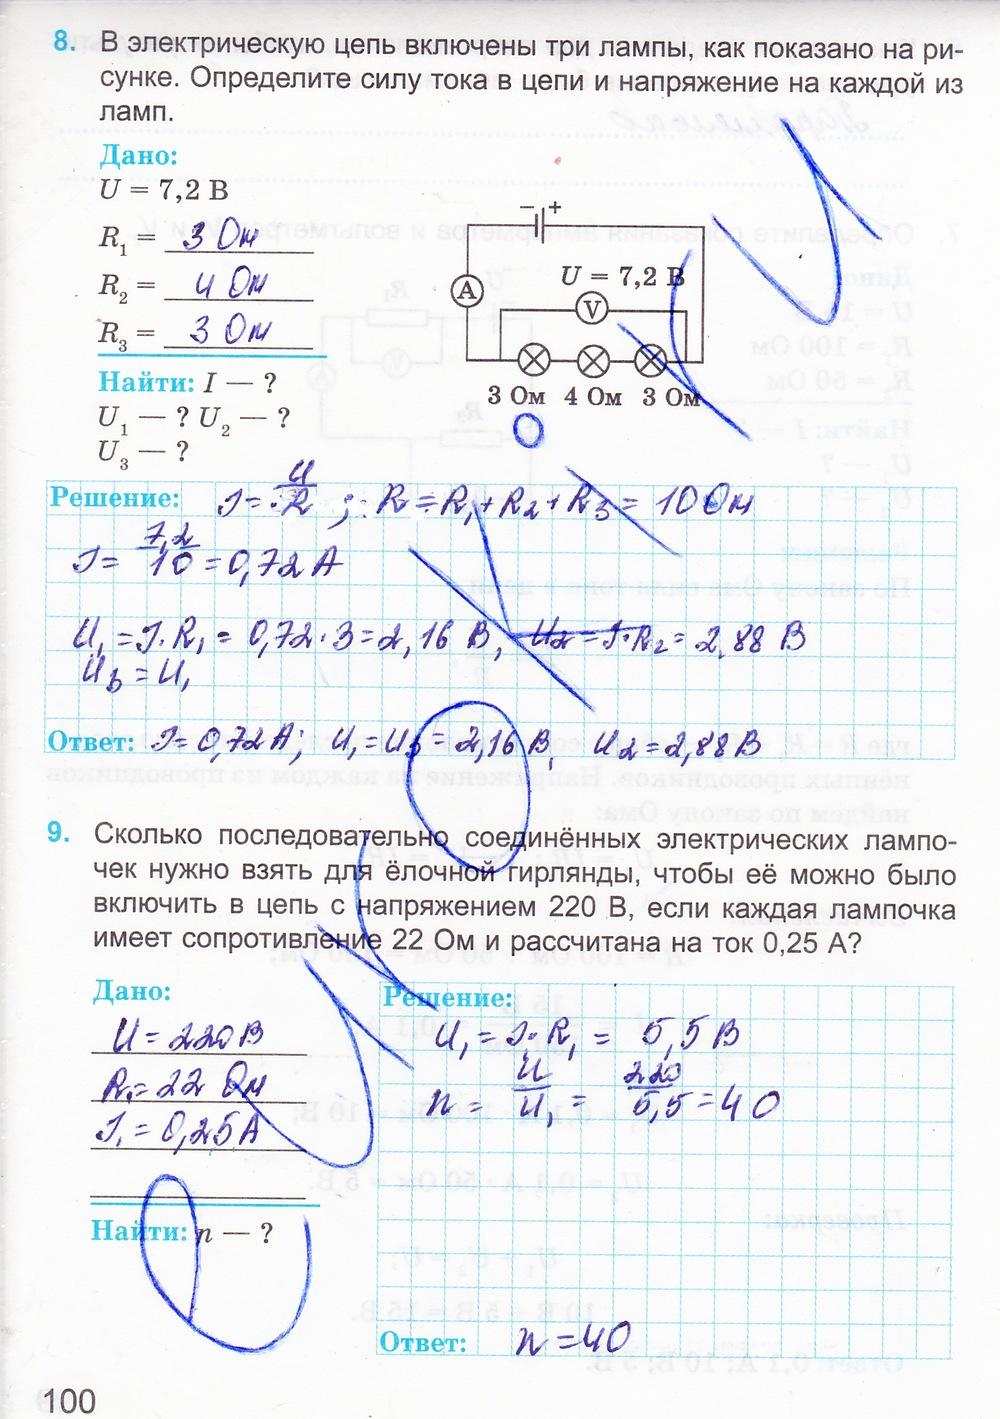 гдз физика 8 класс автор а.в.перышкин